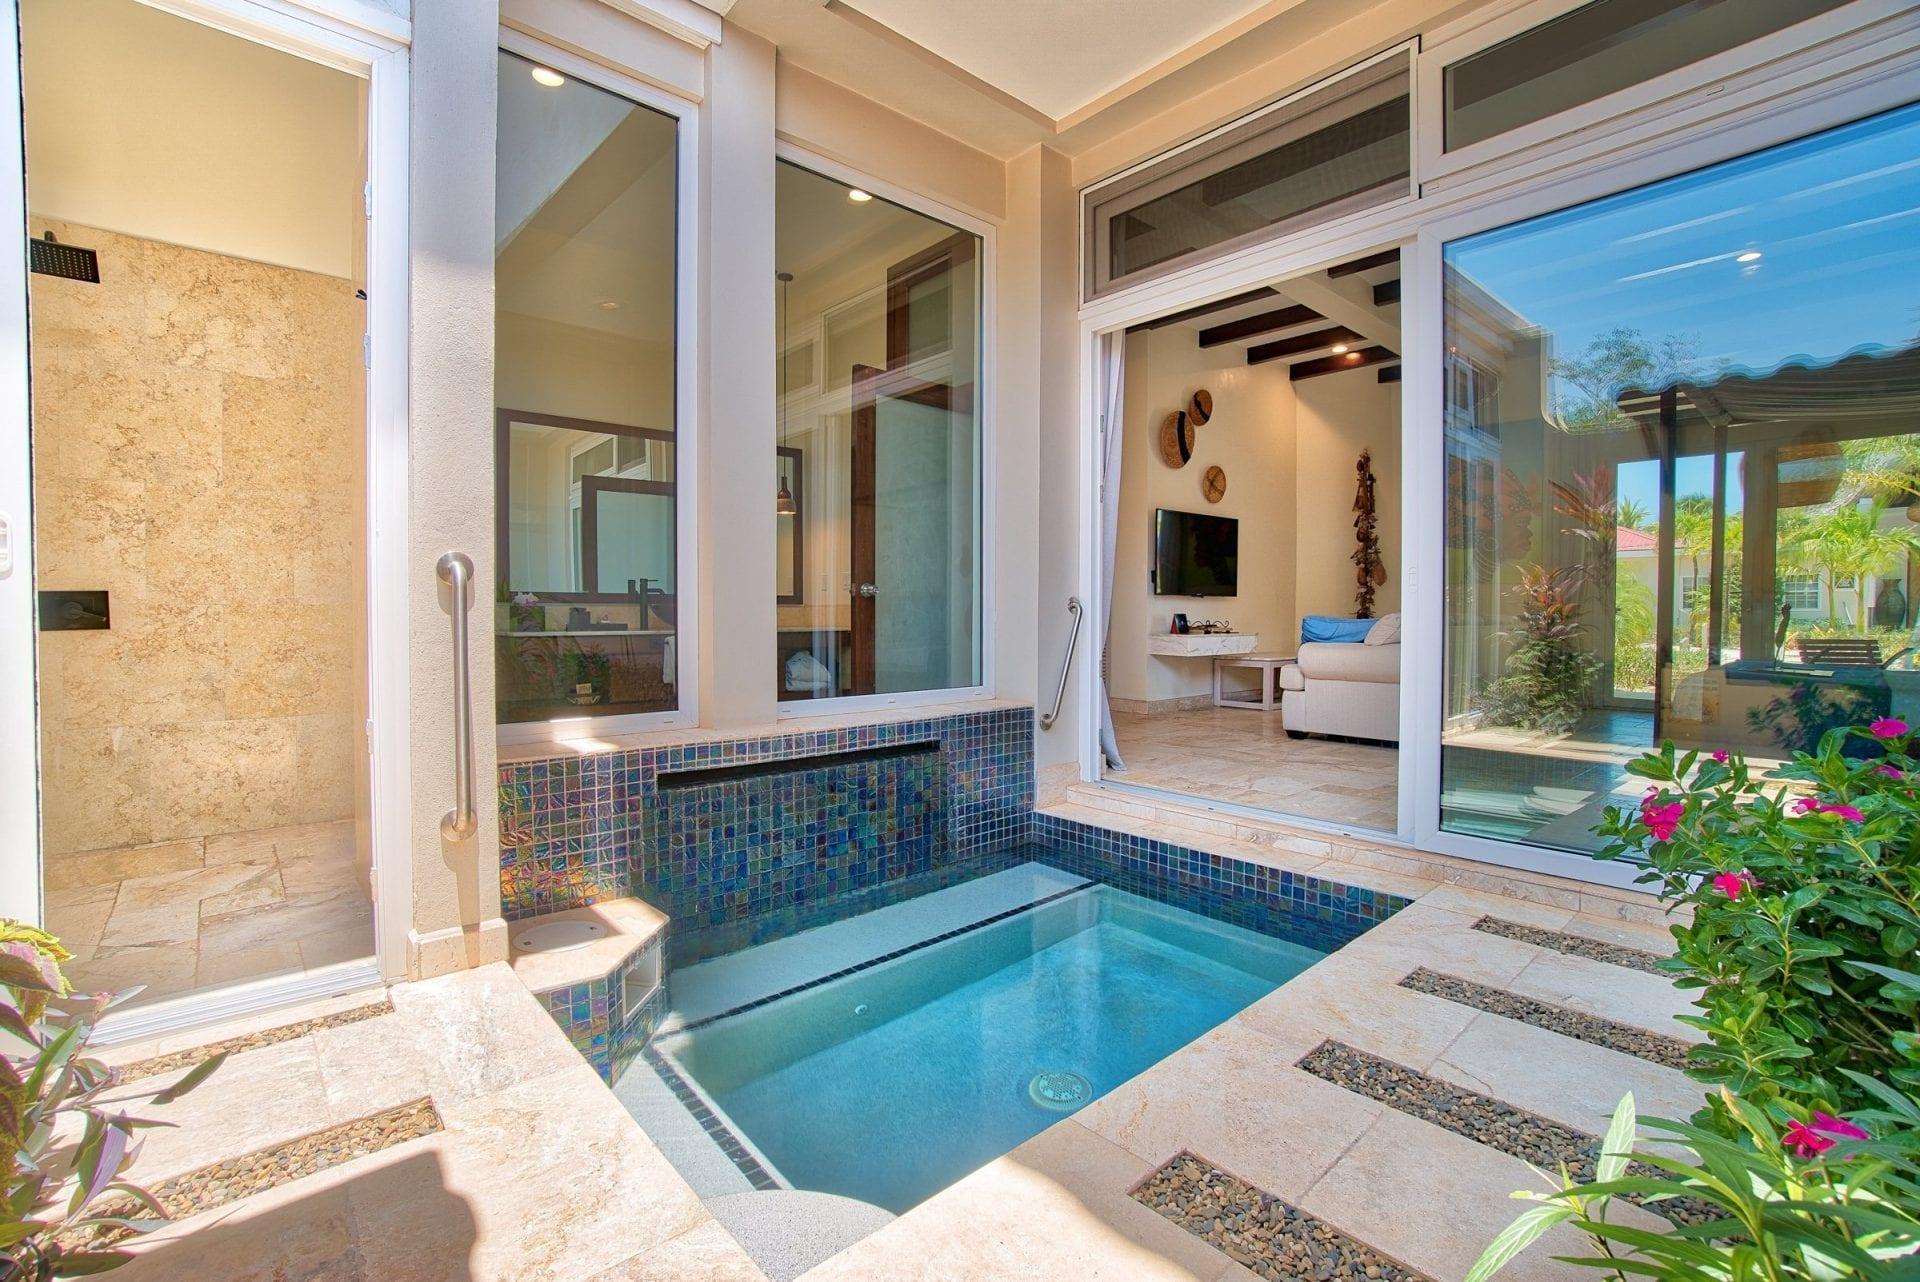 New-Seaview-Villas-with-Plunge-Pool-at-Jaguar-Reef-8